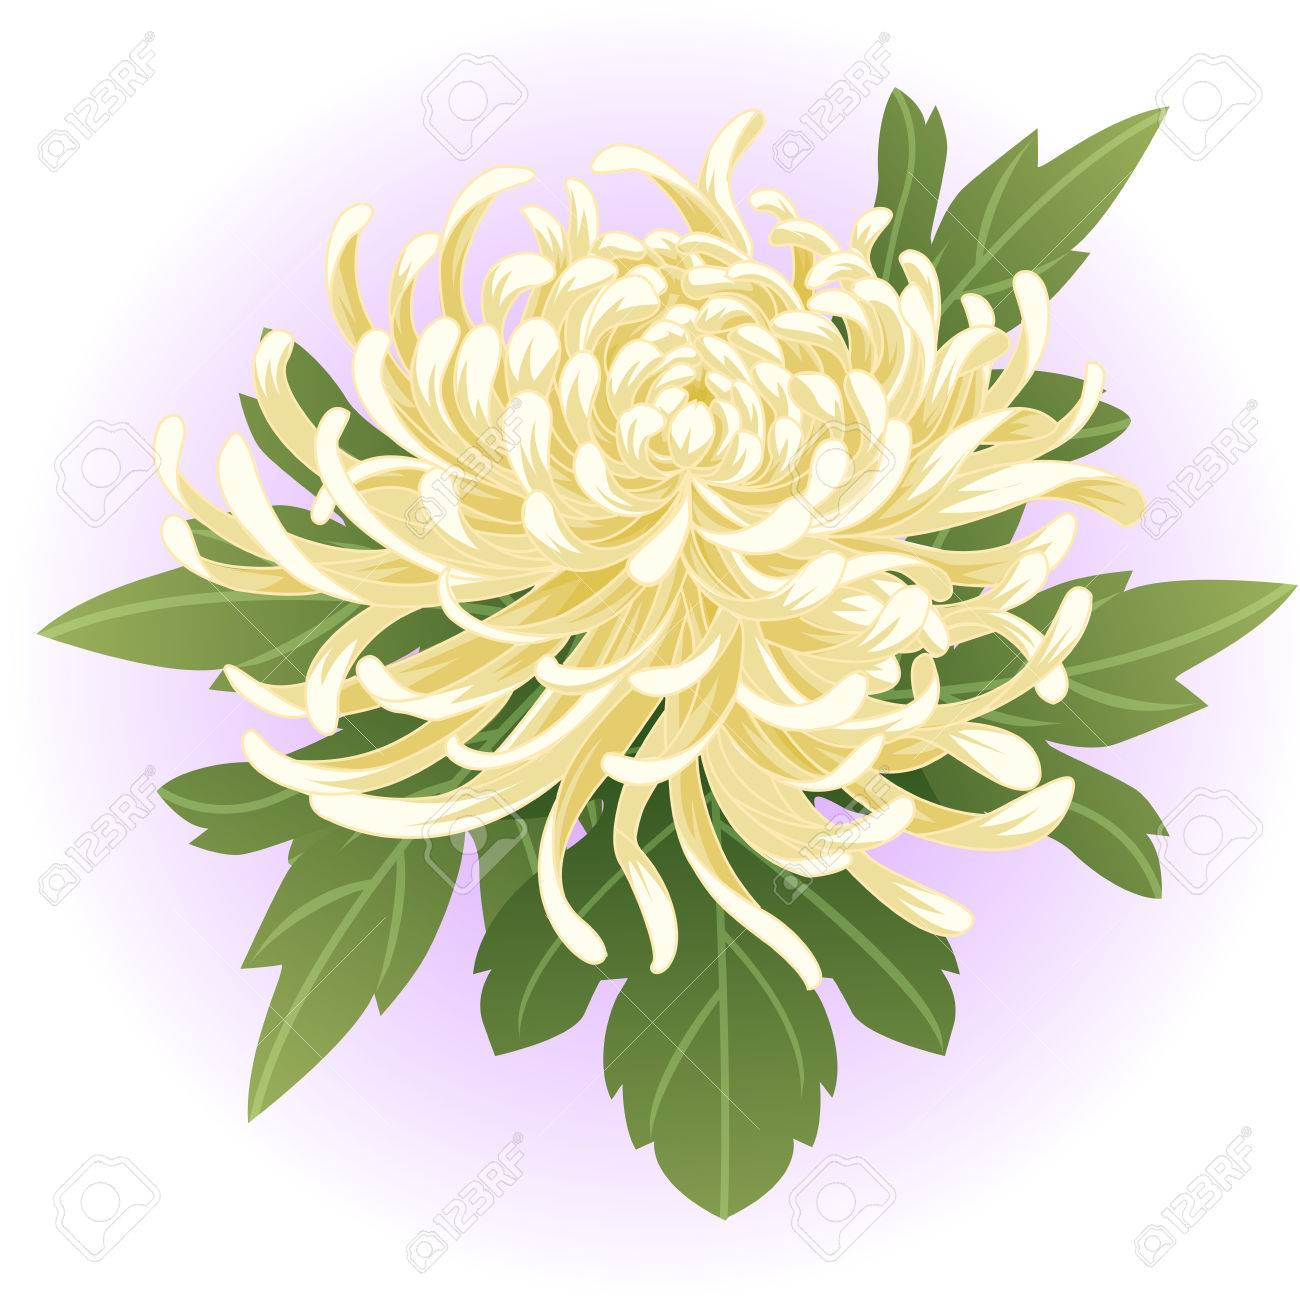 White Chrysanthemum Flower Illustration Royalty Free Cliparts